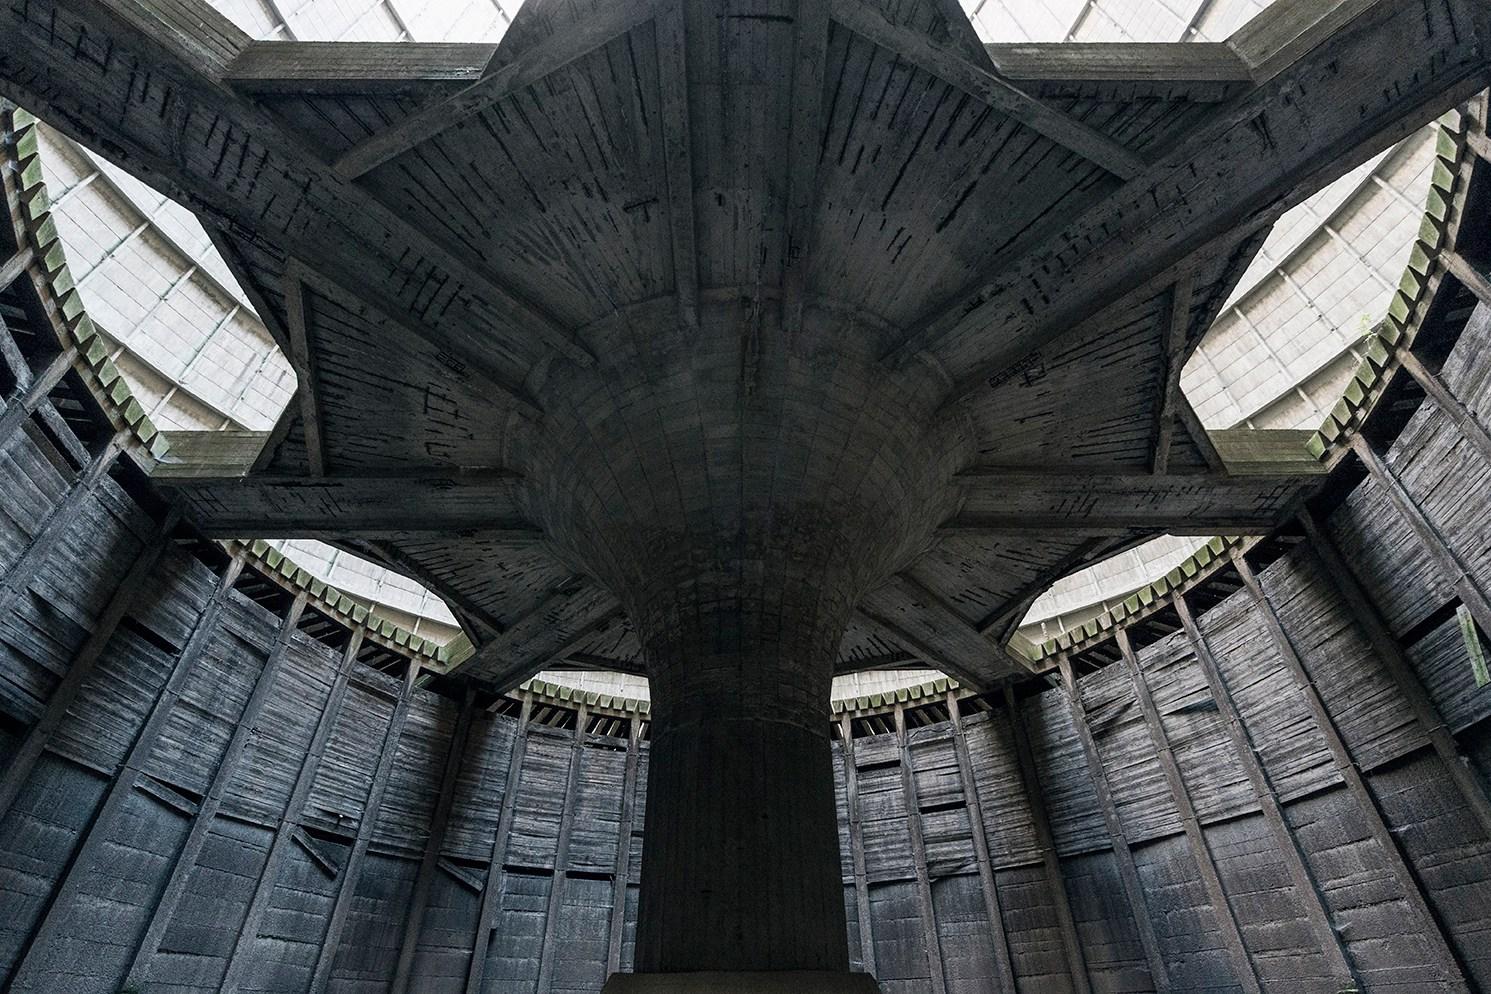 Abandoned-01-IM-Power-Station-Cooling-Tower-—-Charleroi-Belgium